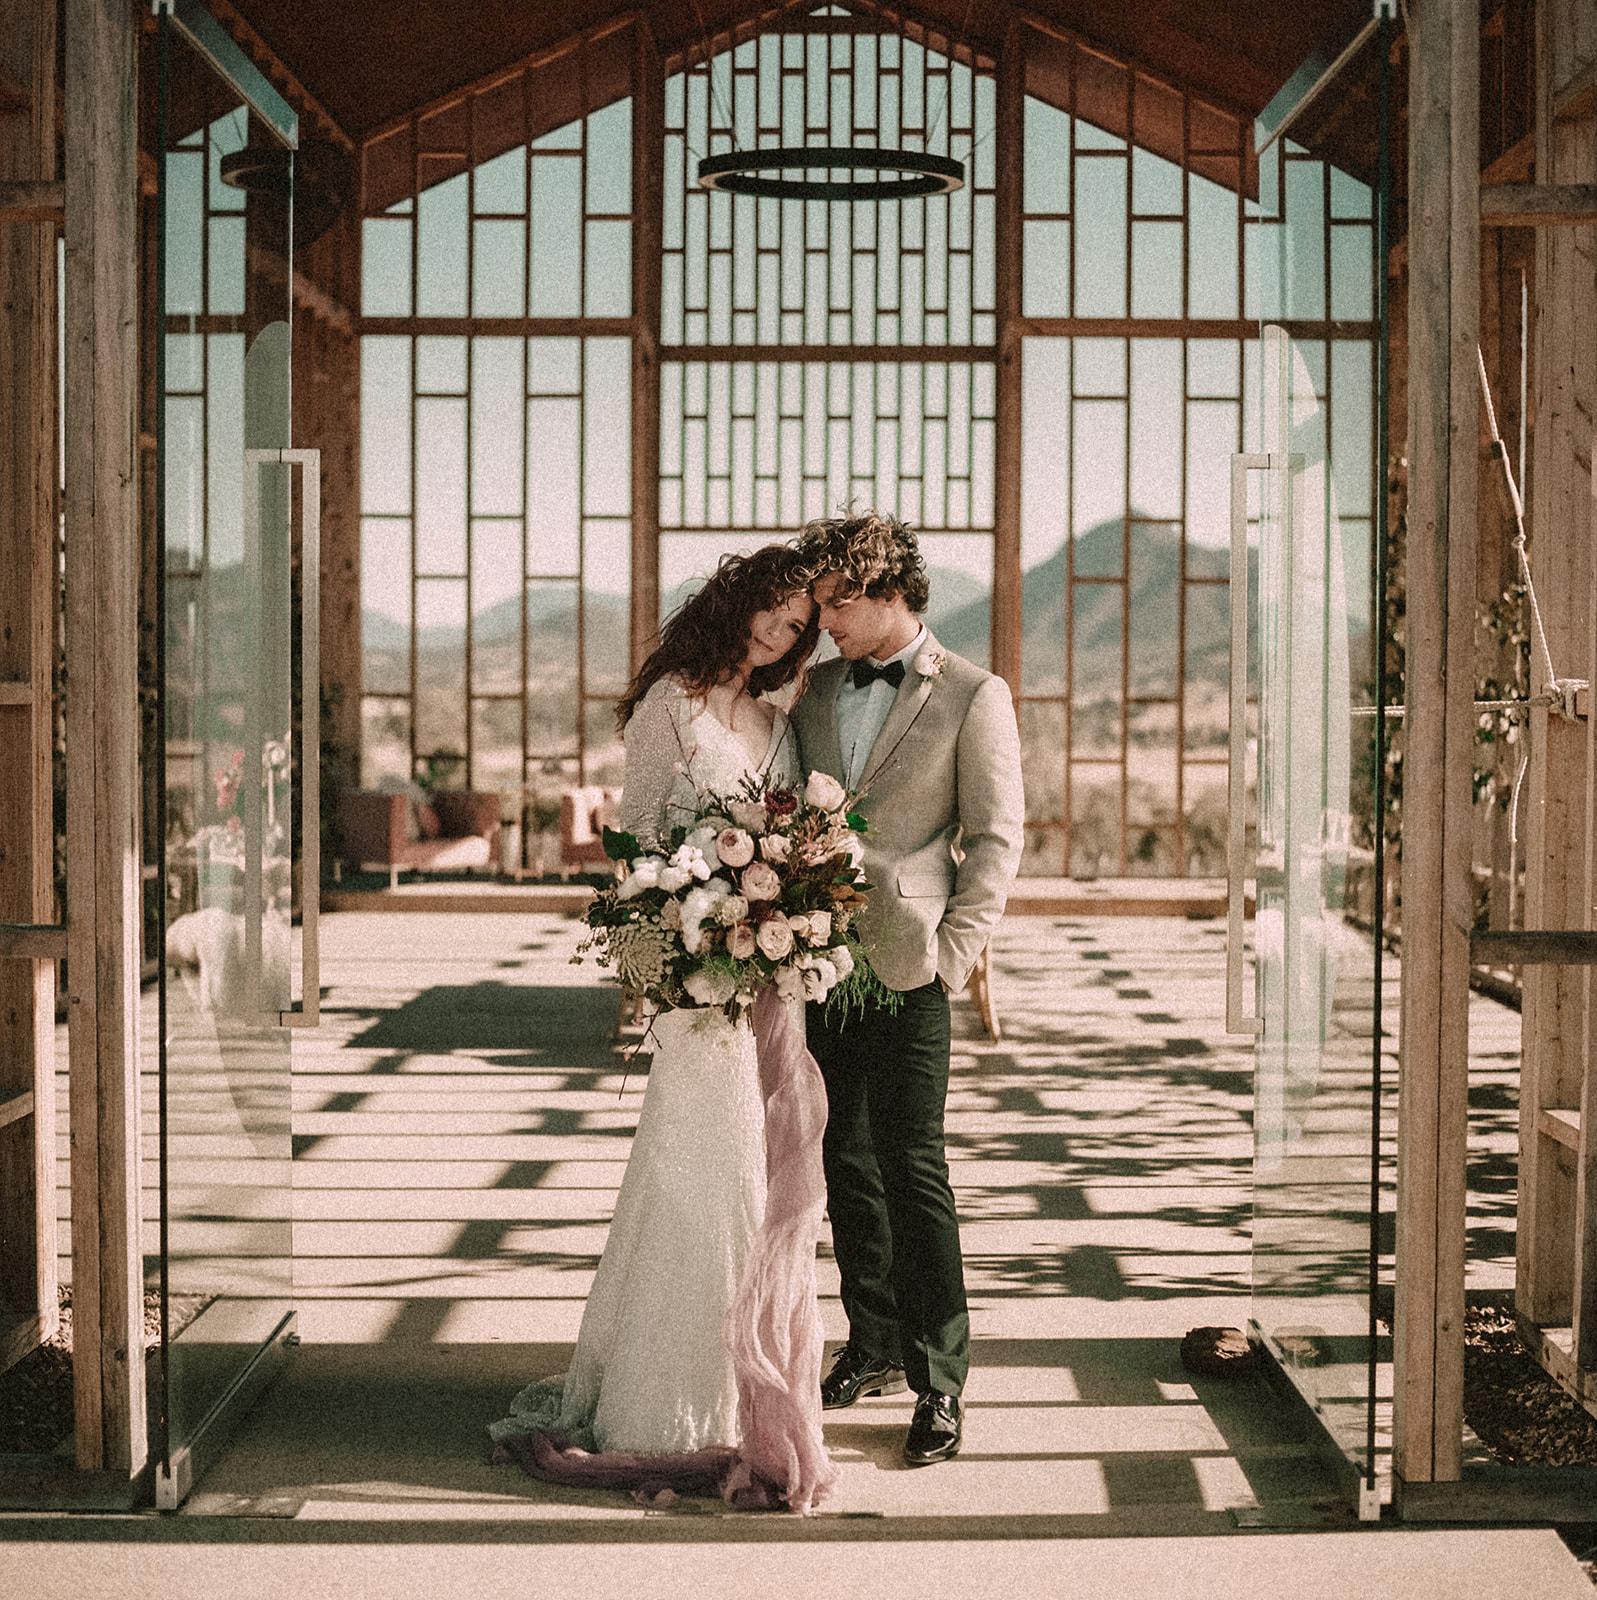 STYLED: WHIMSICAL KOOROOMBA VINEYARD LAVENDER FARM WEDDING INSPIRATION | MT ALFORD QLD